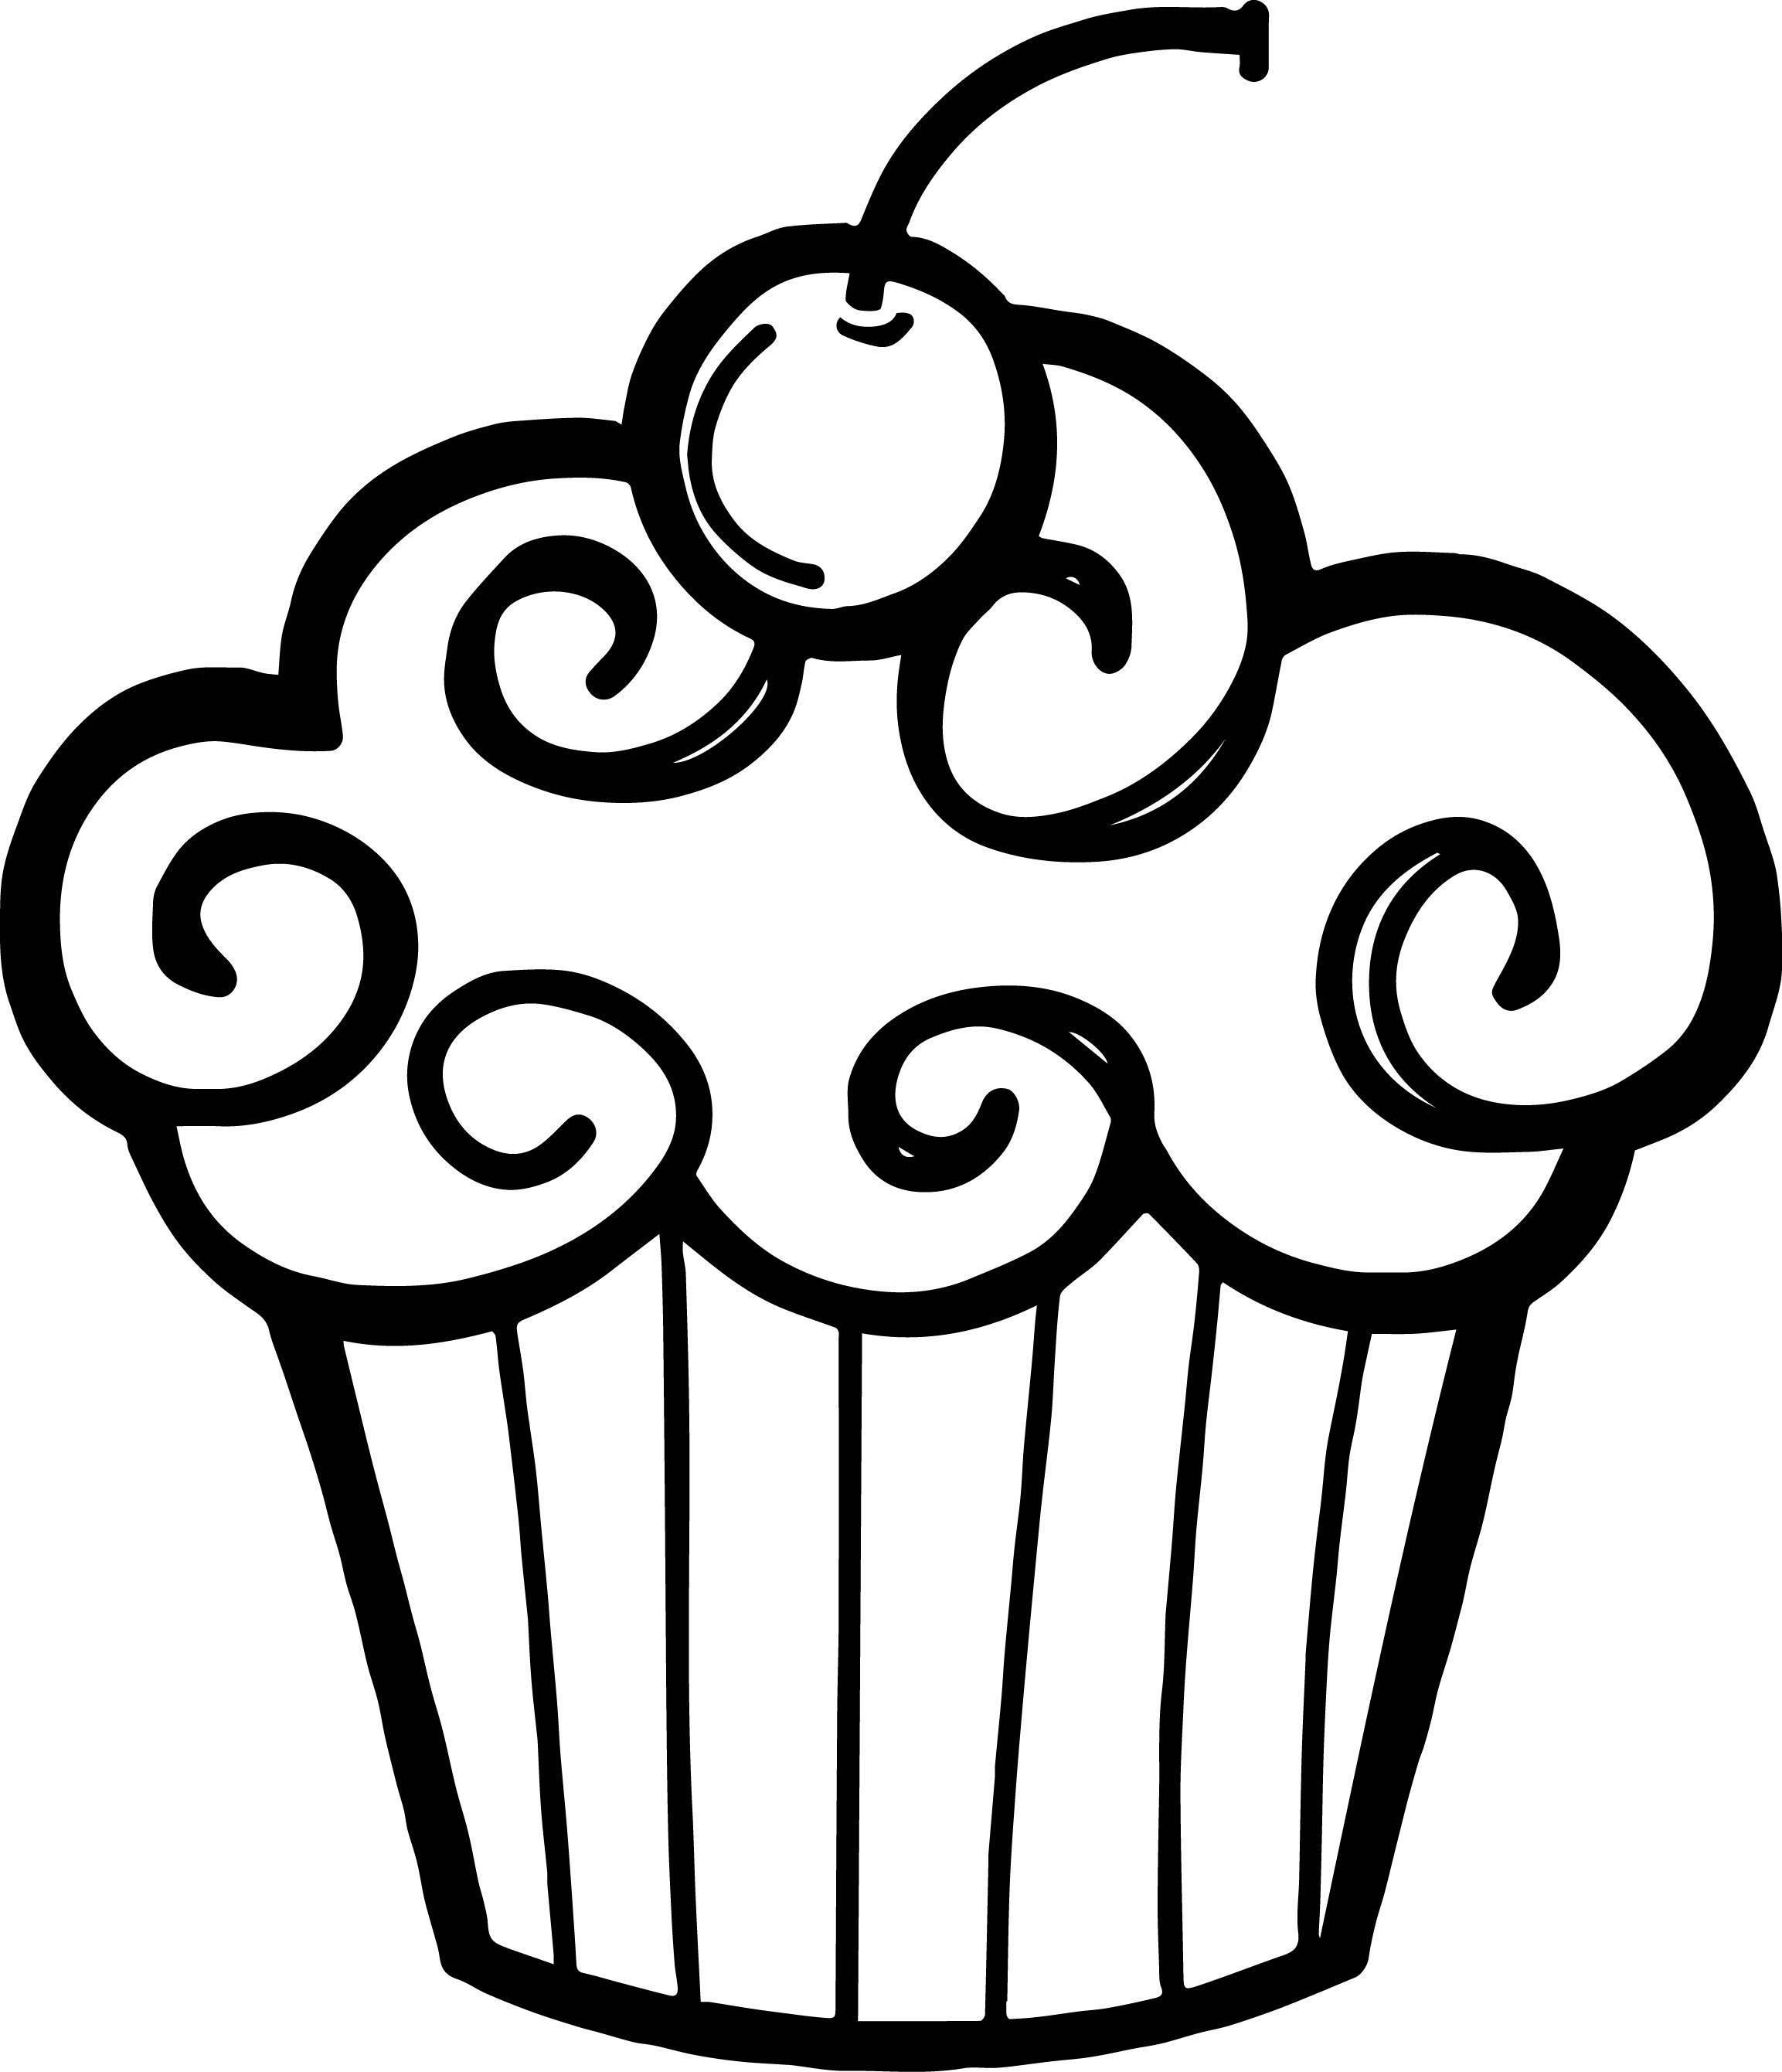 Cupcake outline clip art clipart 2